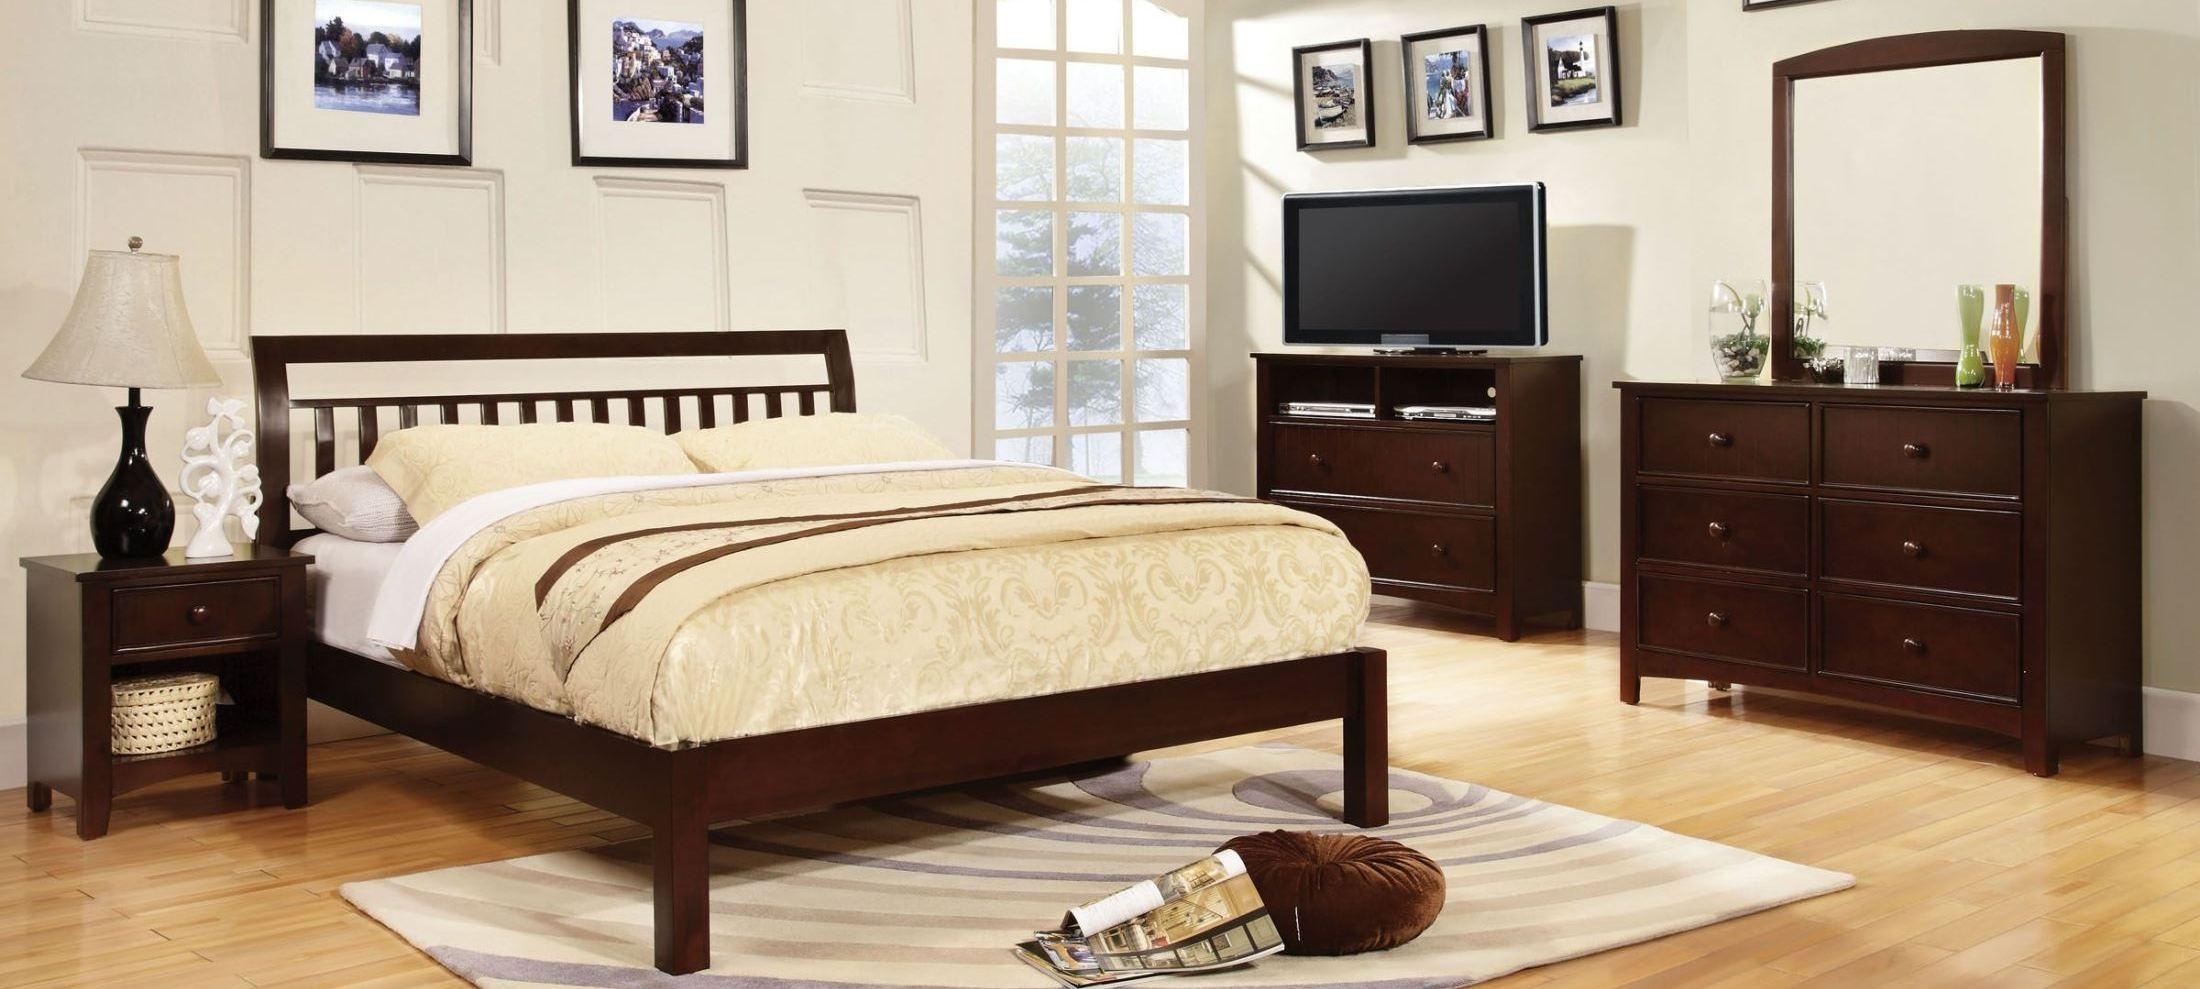 Corry Dark Walnut Youth Platform Bedroom Set From